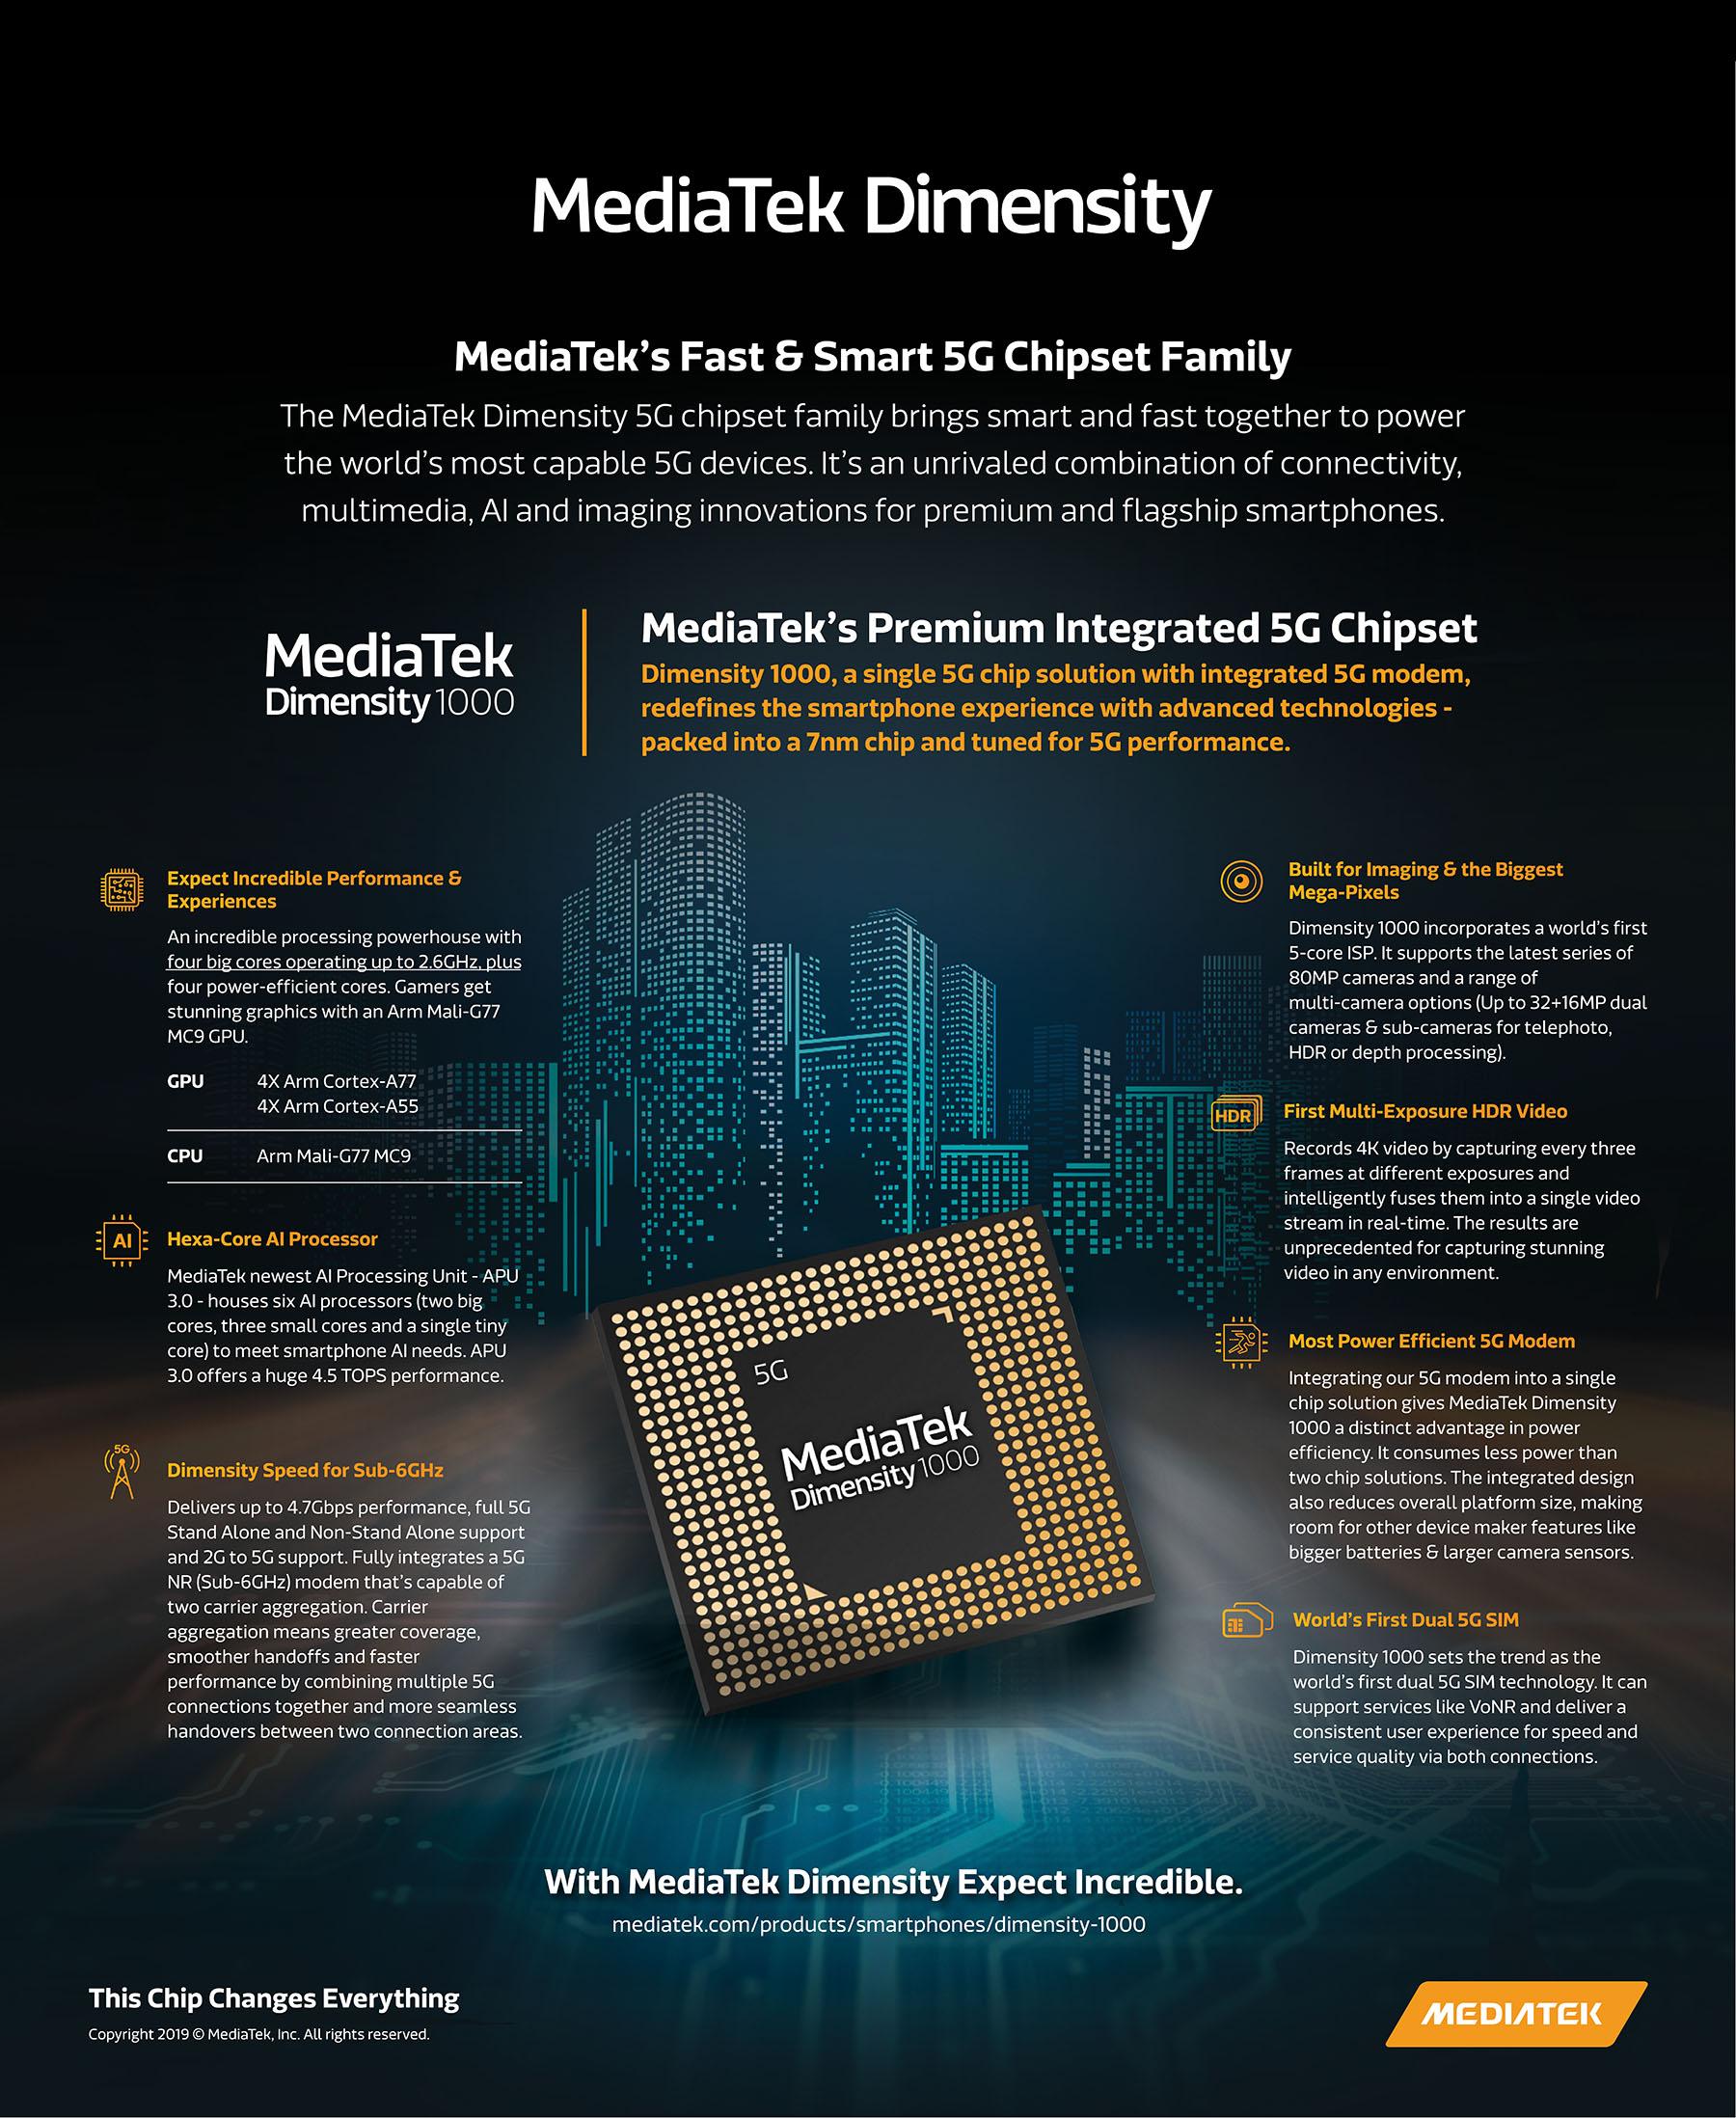 mediatek-dimensity-1000-infographicfinal-jpg.8834